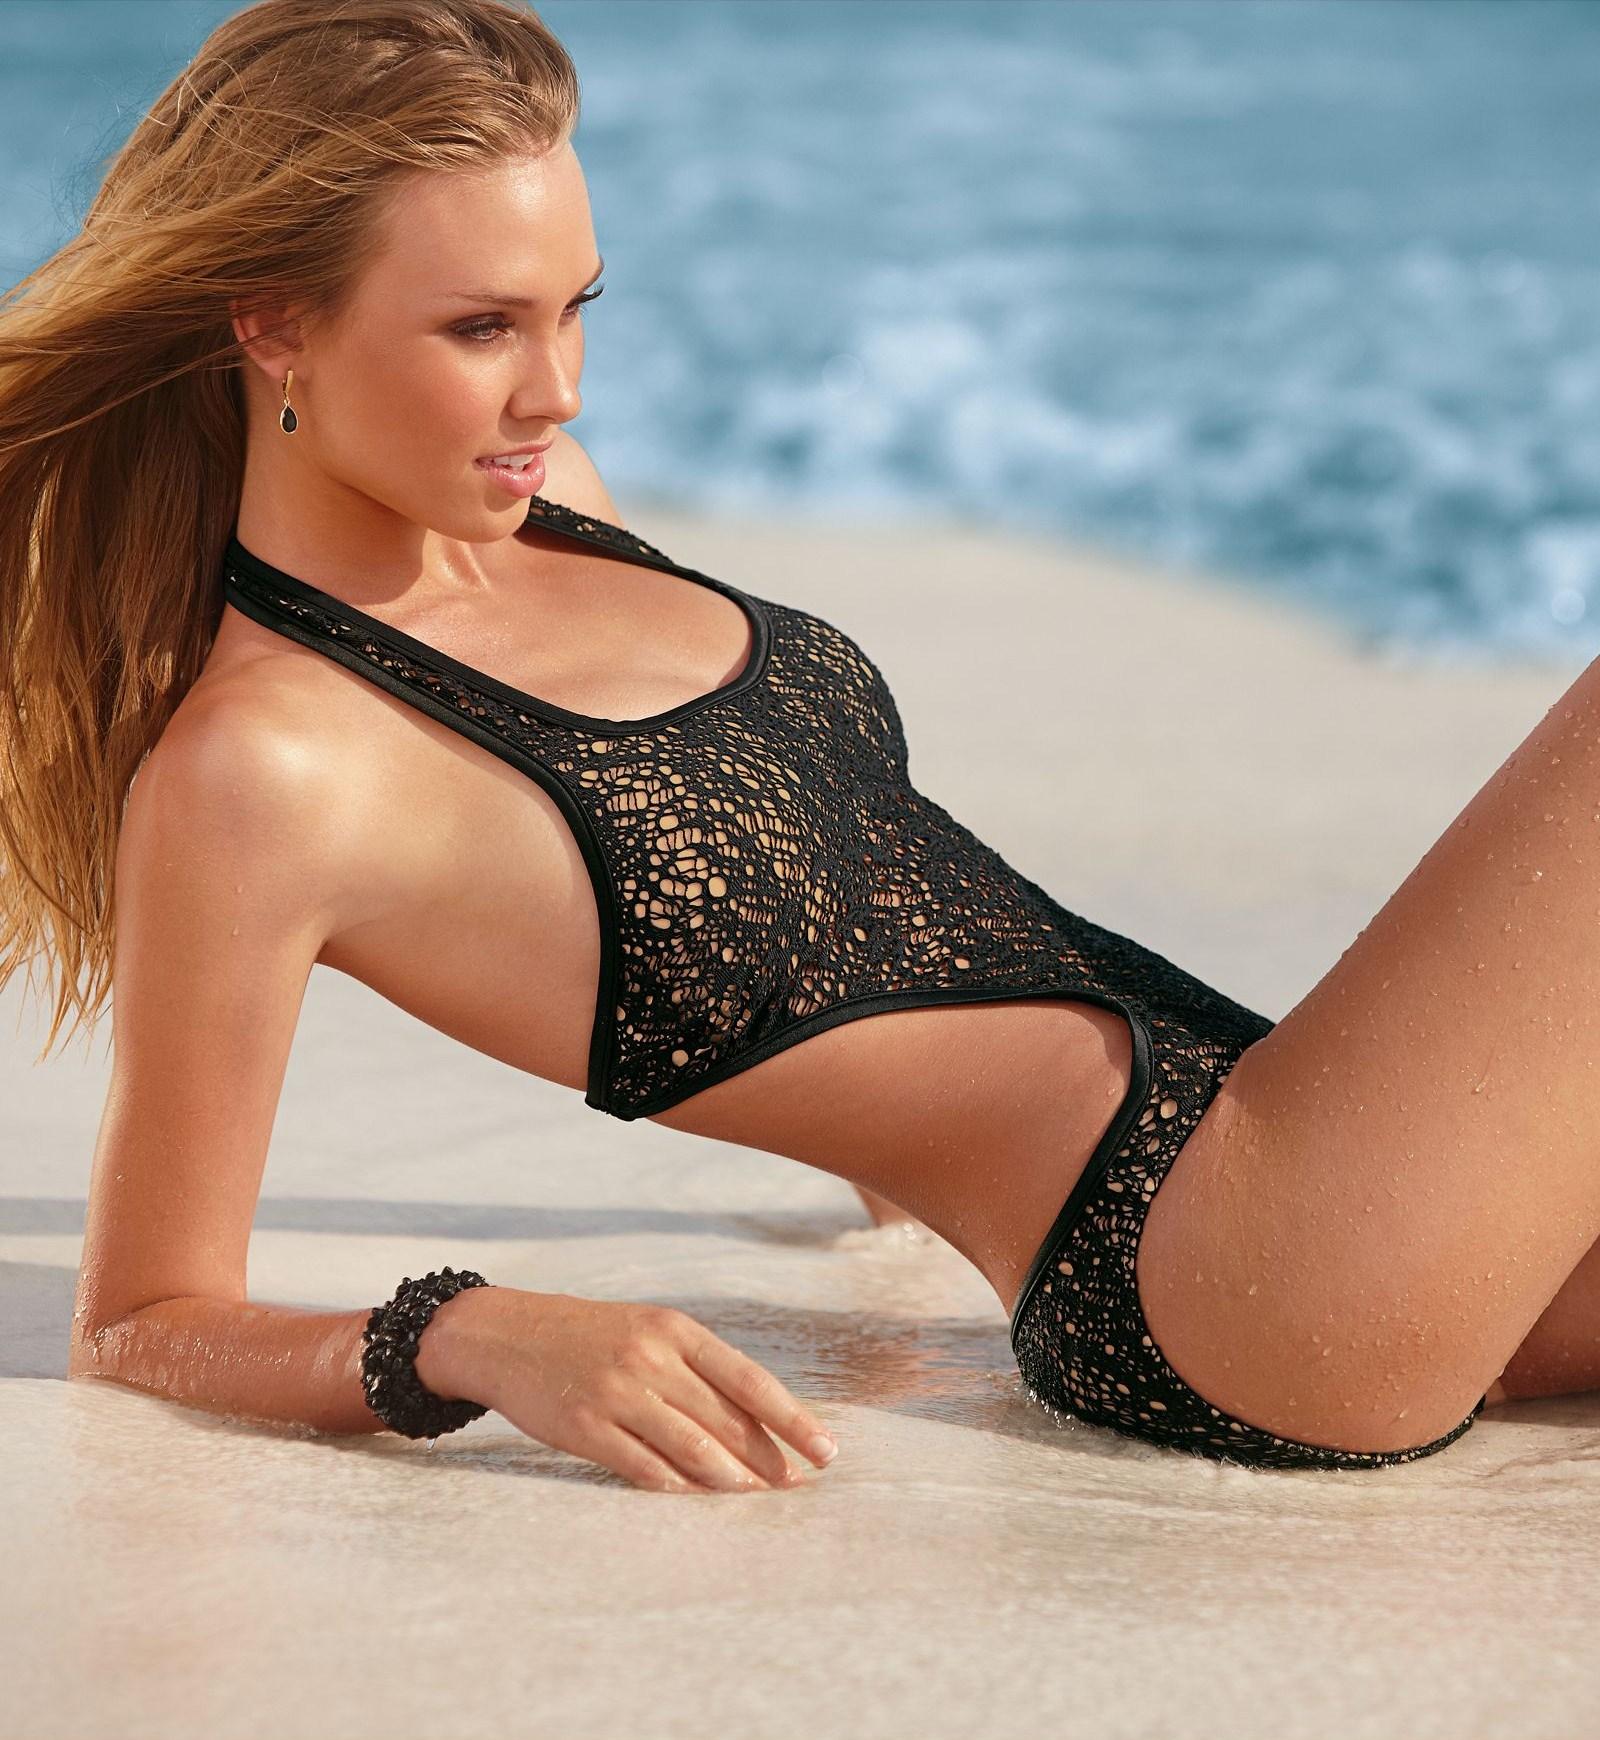 2fc123d269 Venus Swimwear Catalog Model List - General Discussion - Bellazon